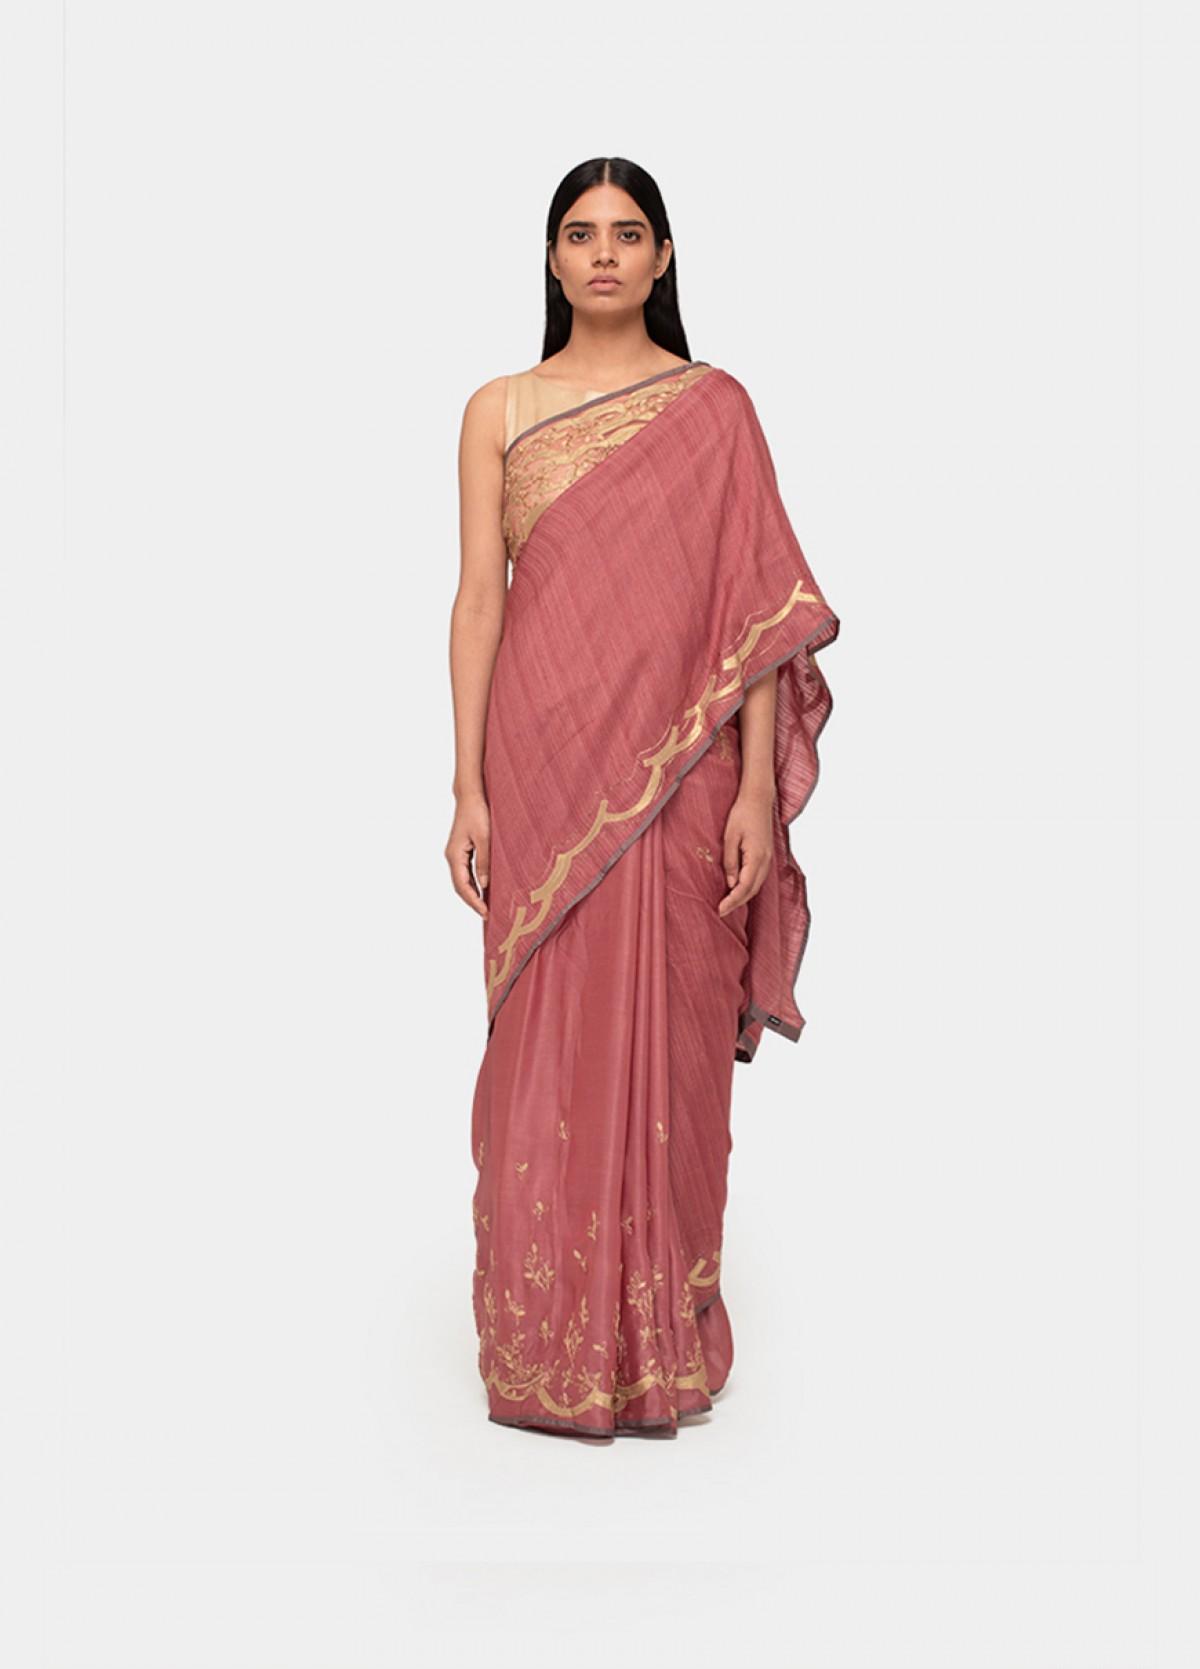 The Ethereal Sari